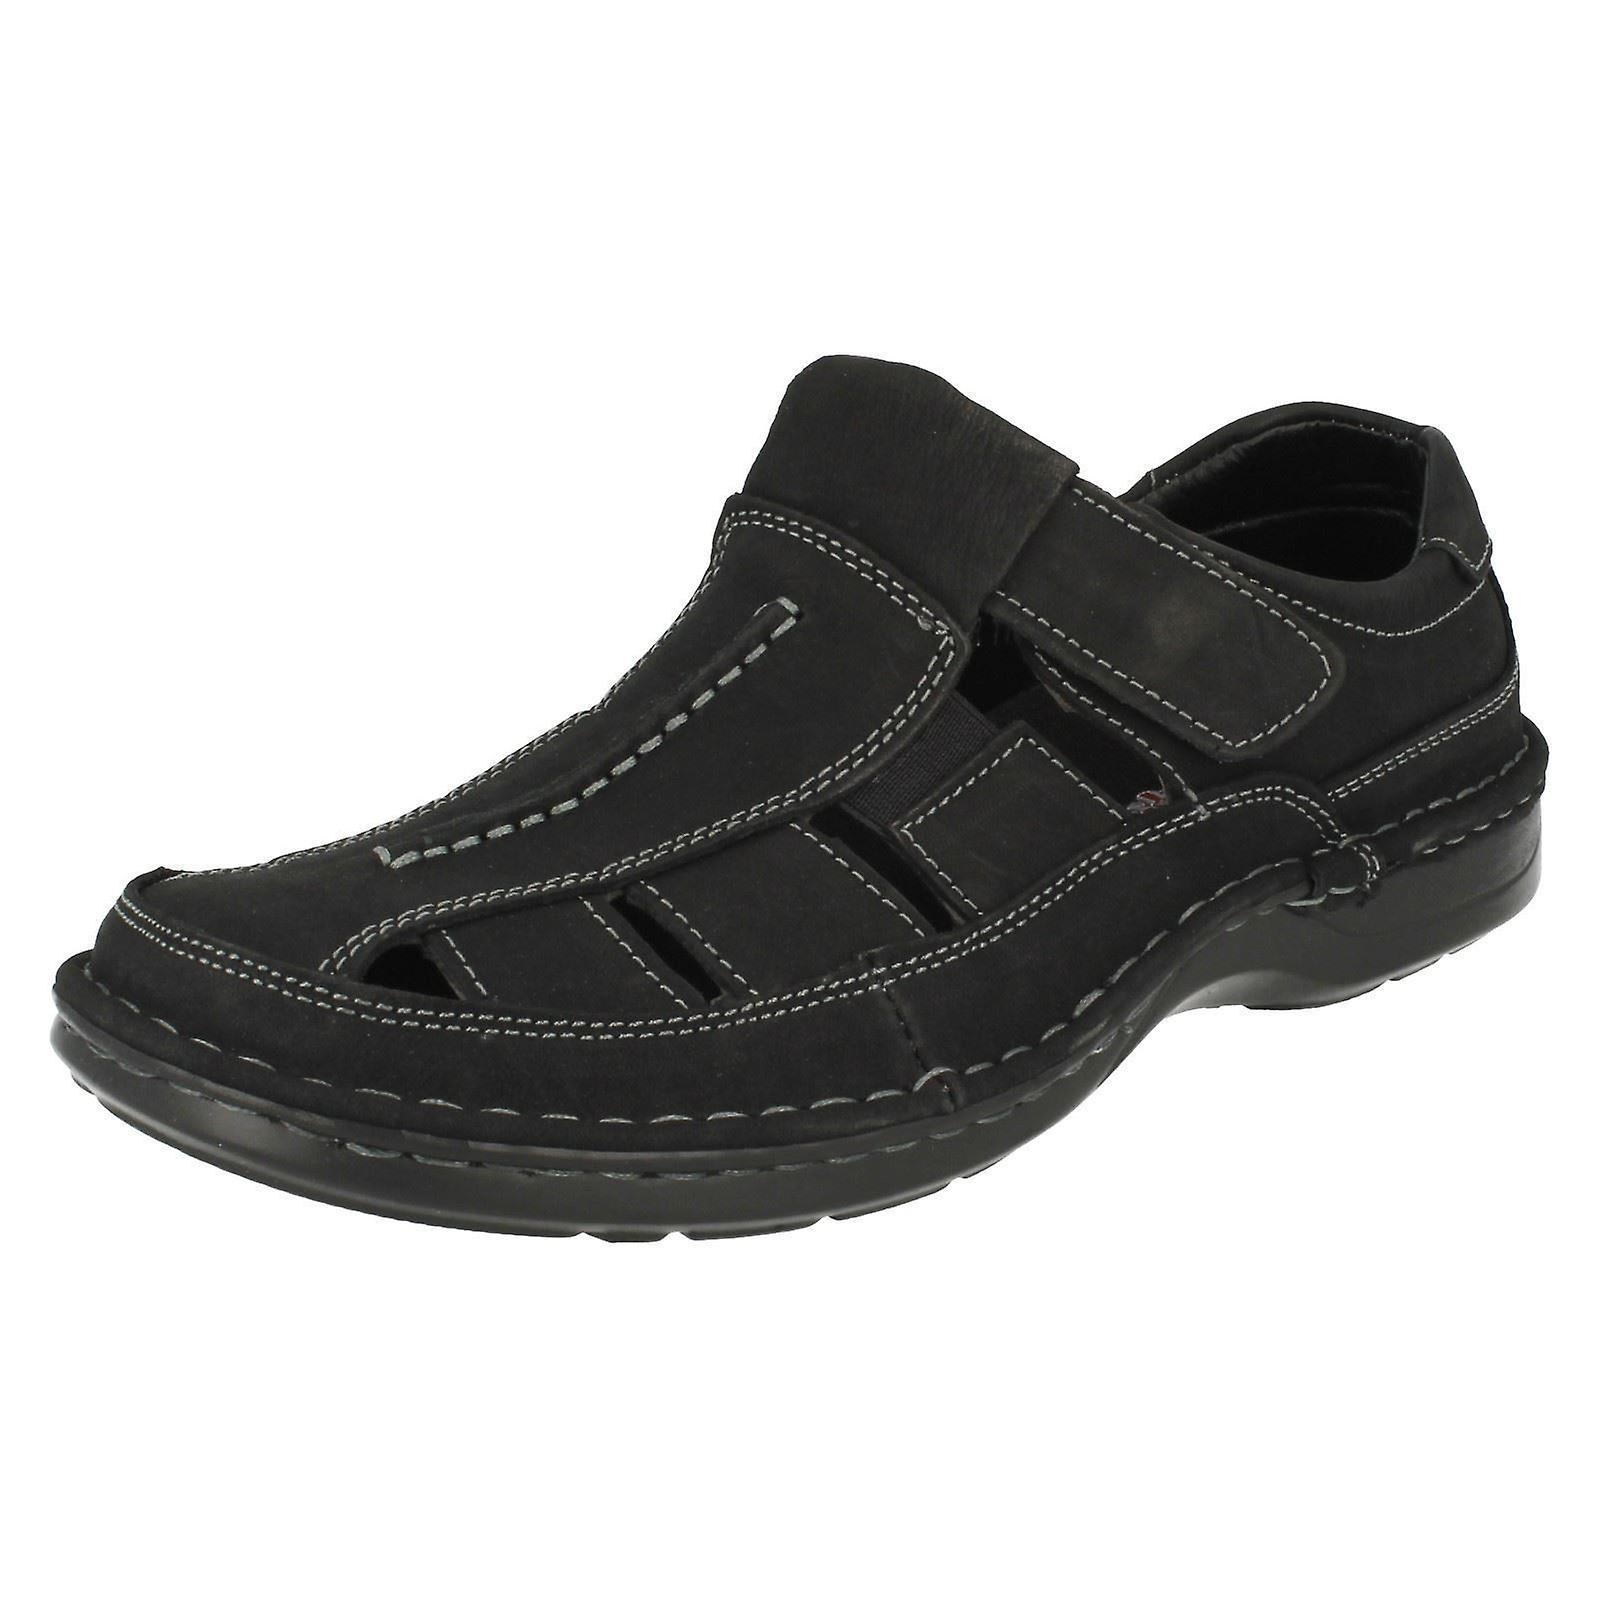 f59021f53510 Mens Padders Closed Toe Leather Sandals Breaker